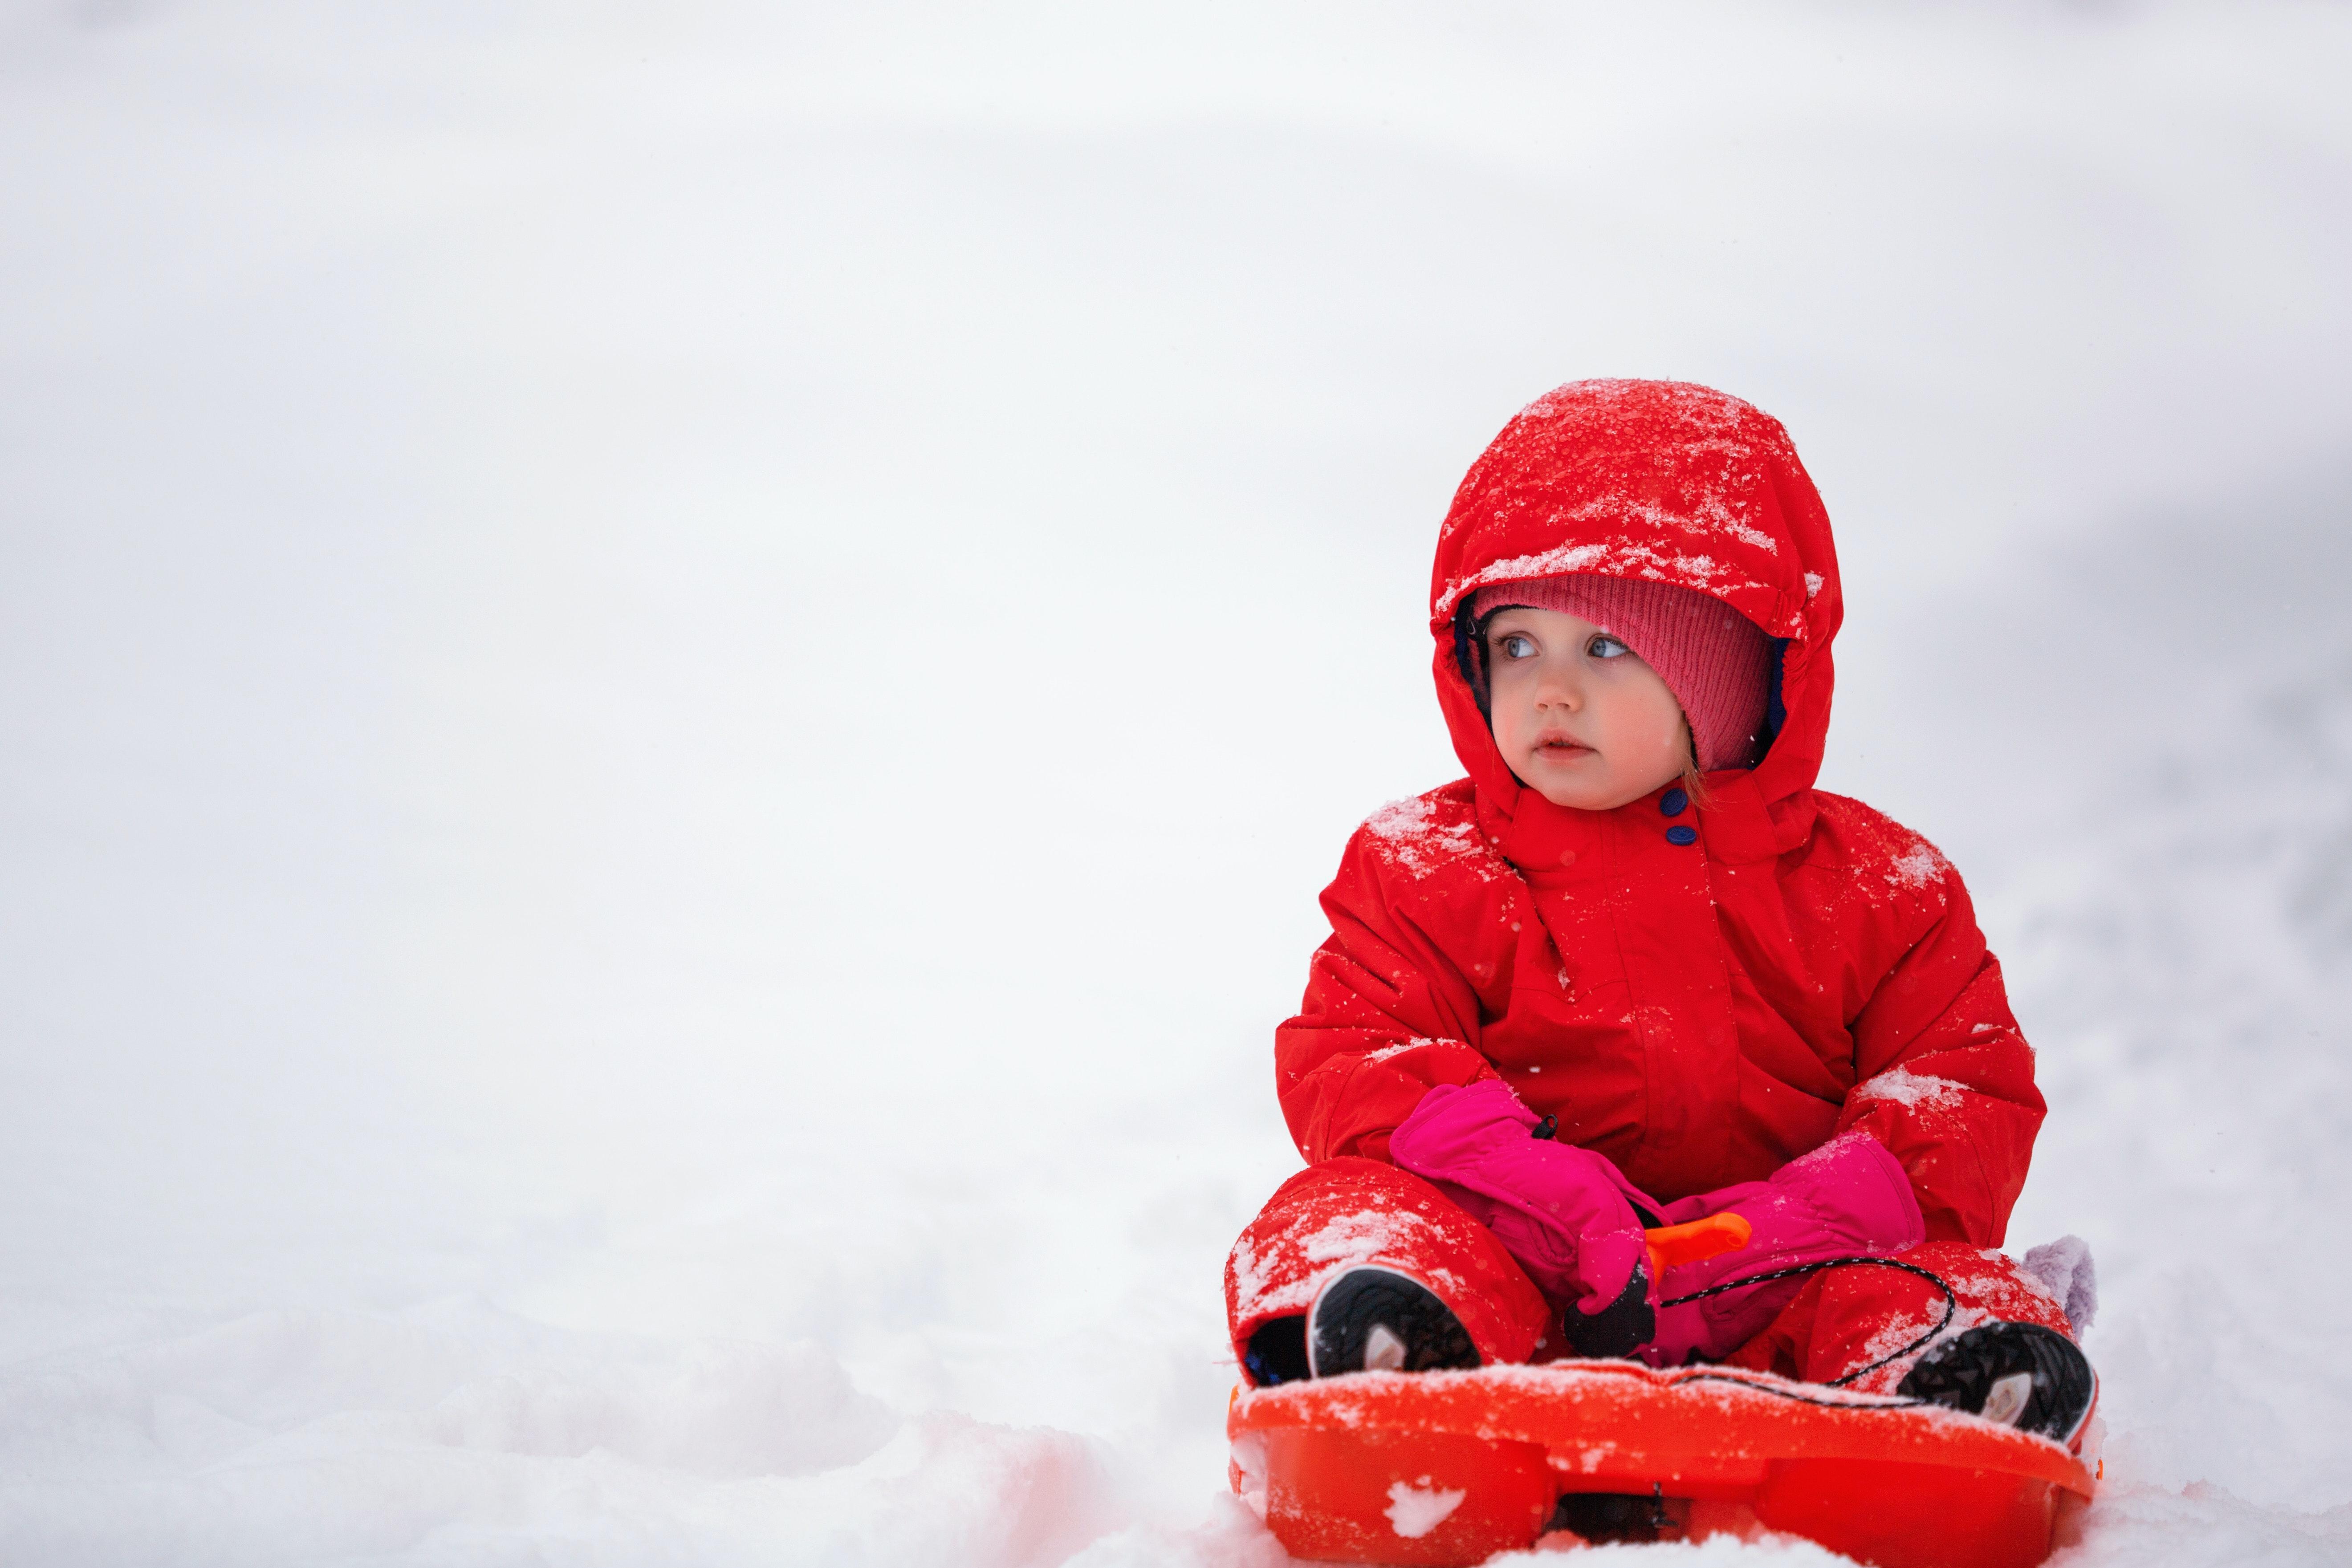 toddler dressed in red in a toboggan in a ski resort